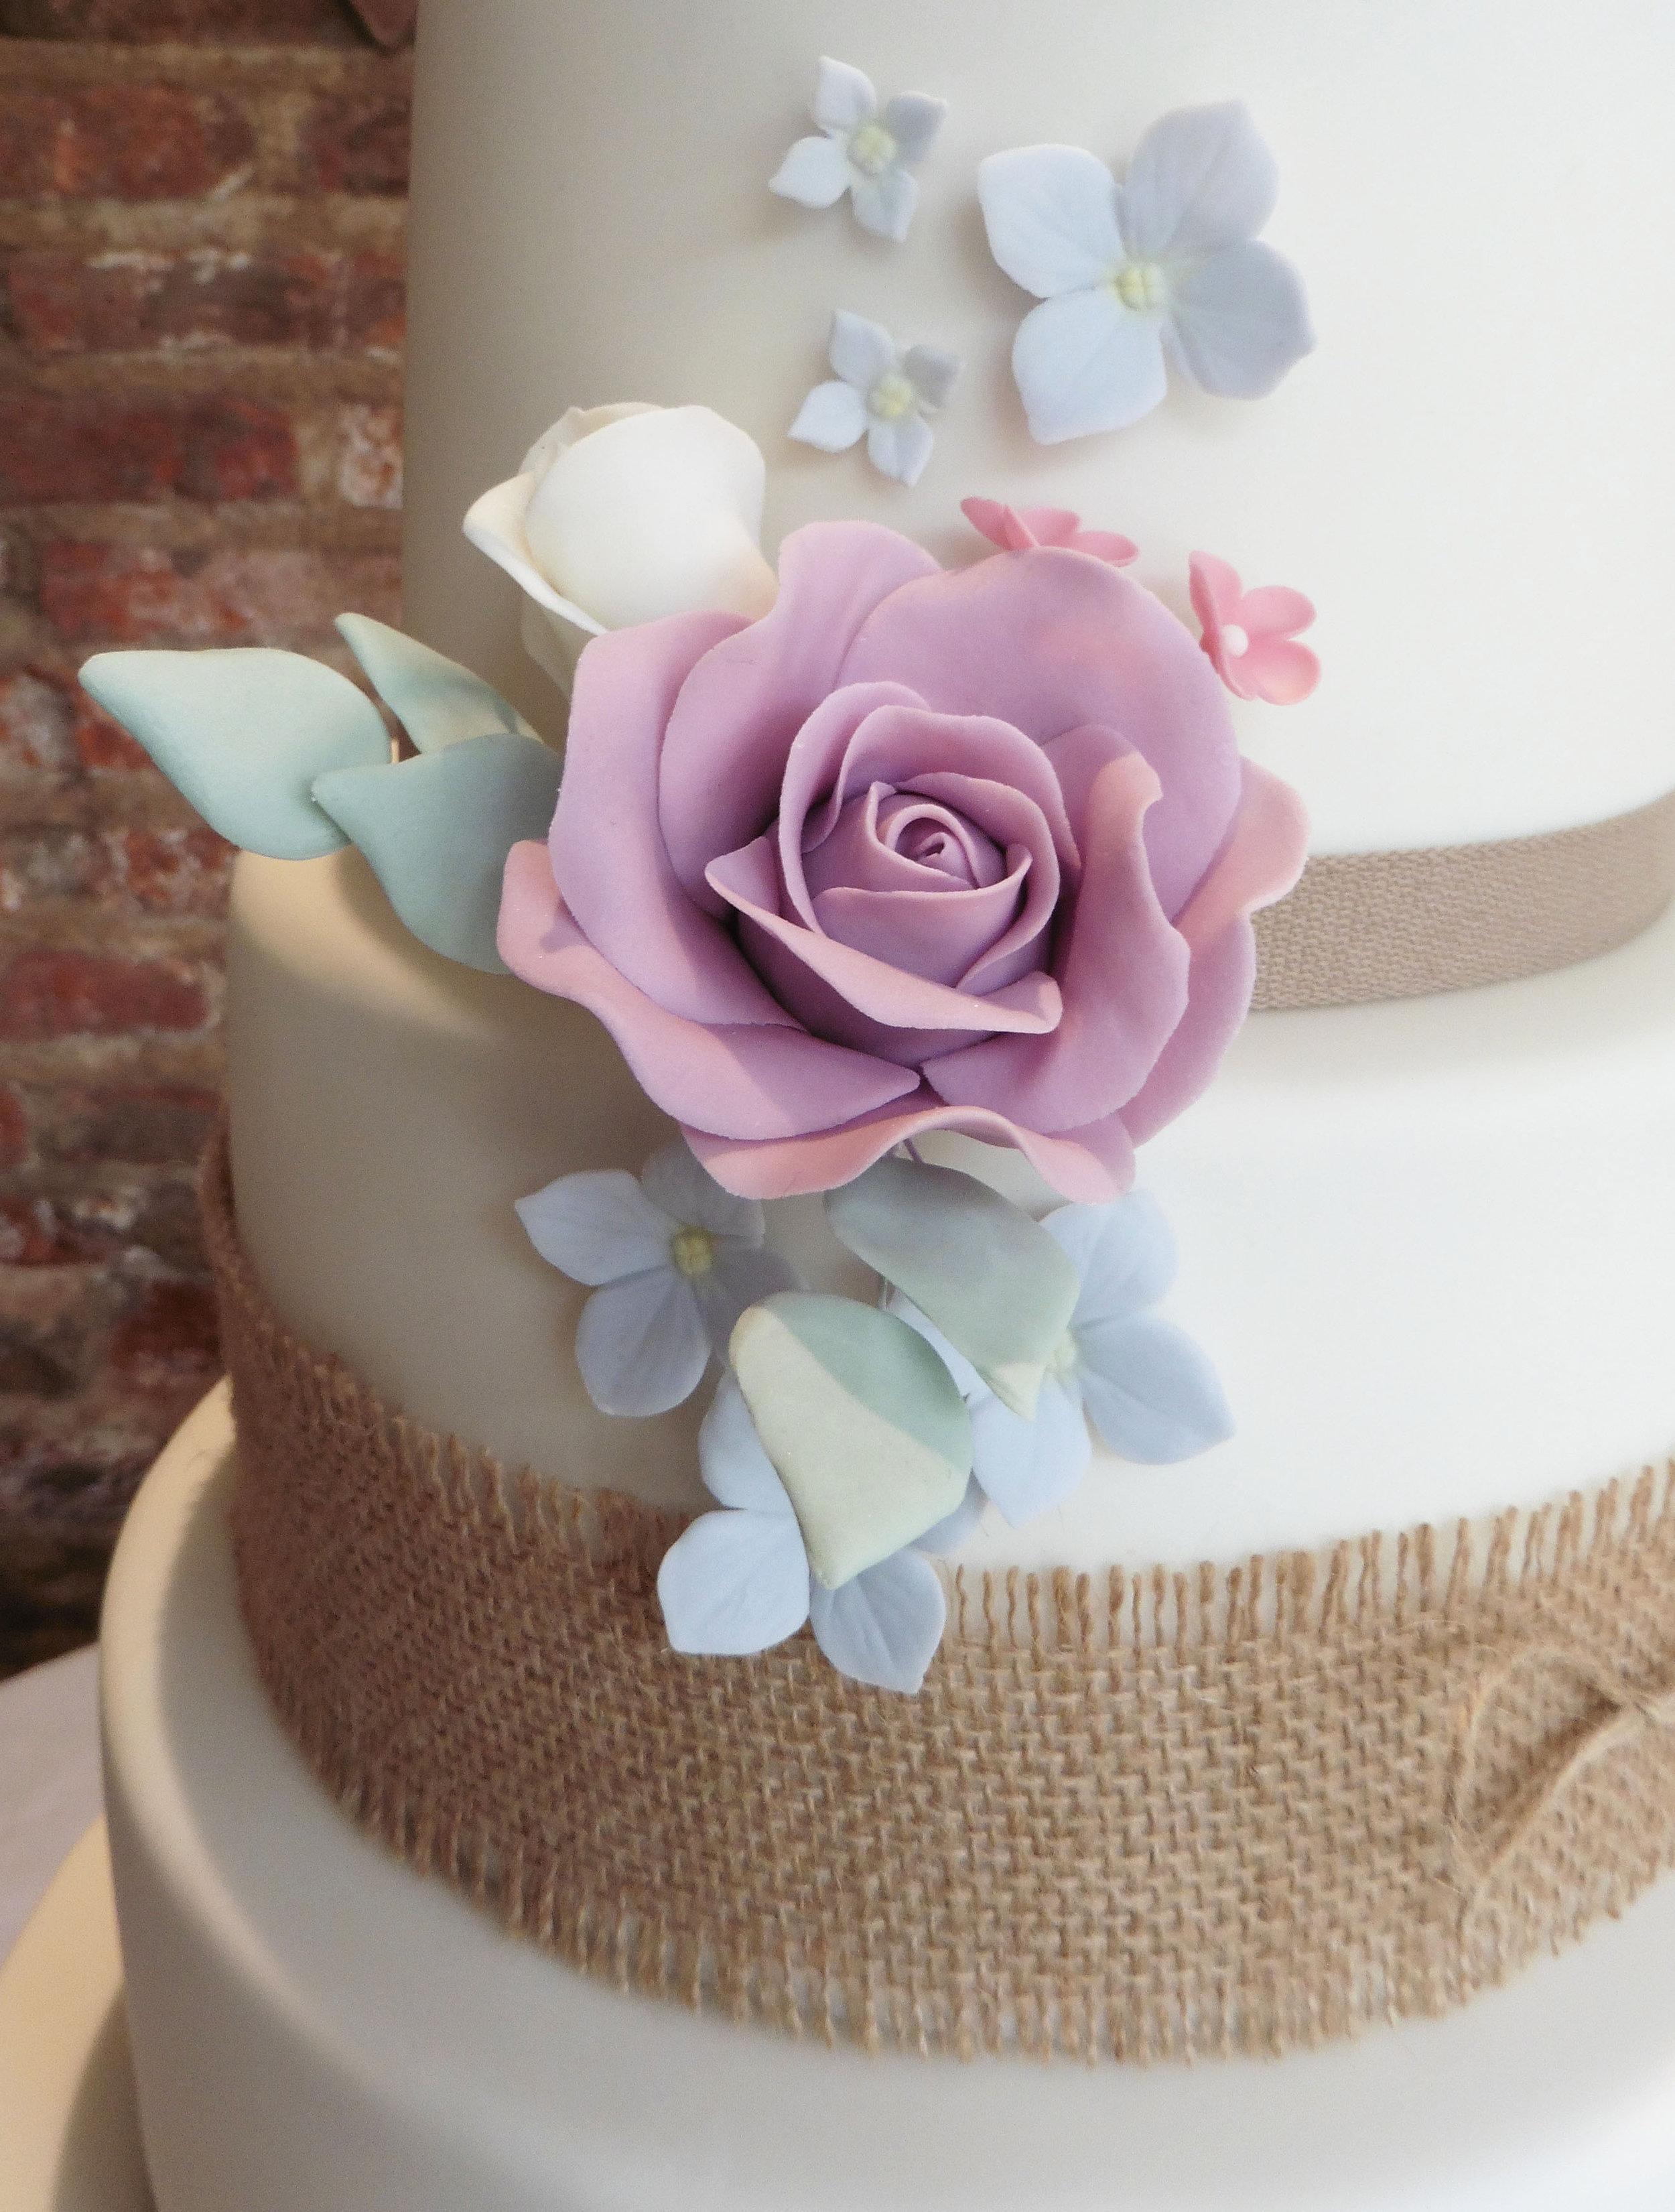 Rose and hydrangea wedding cake